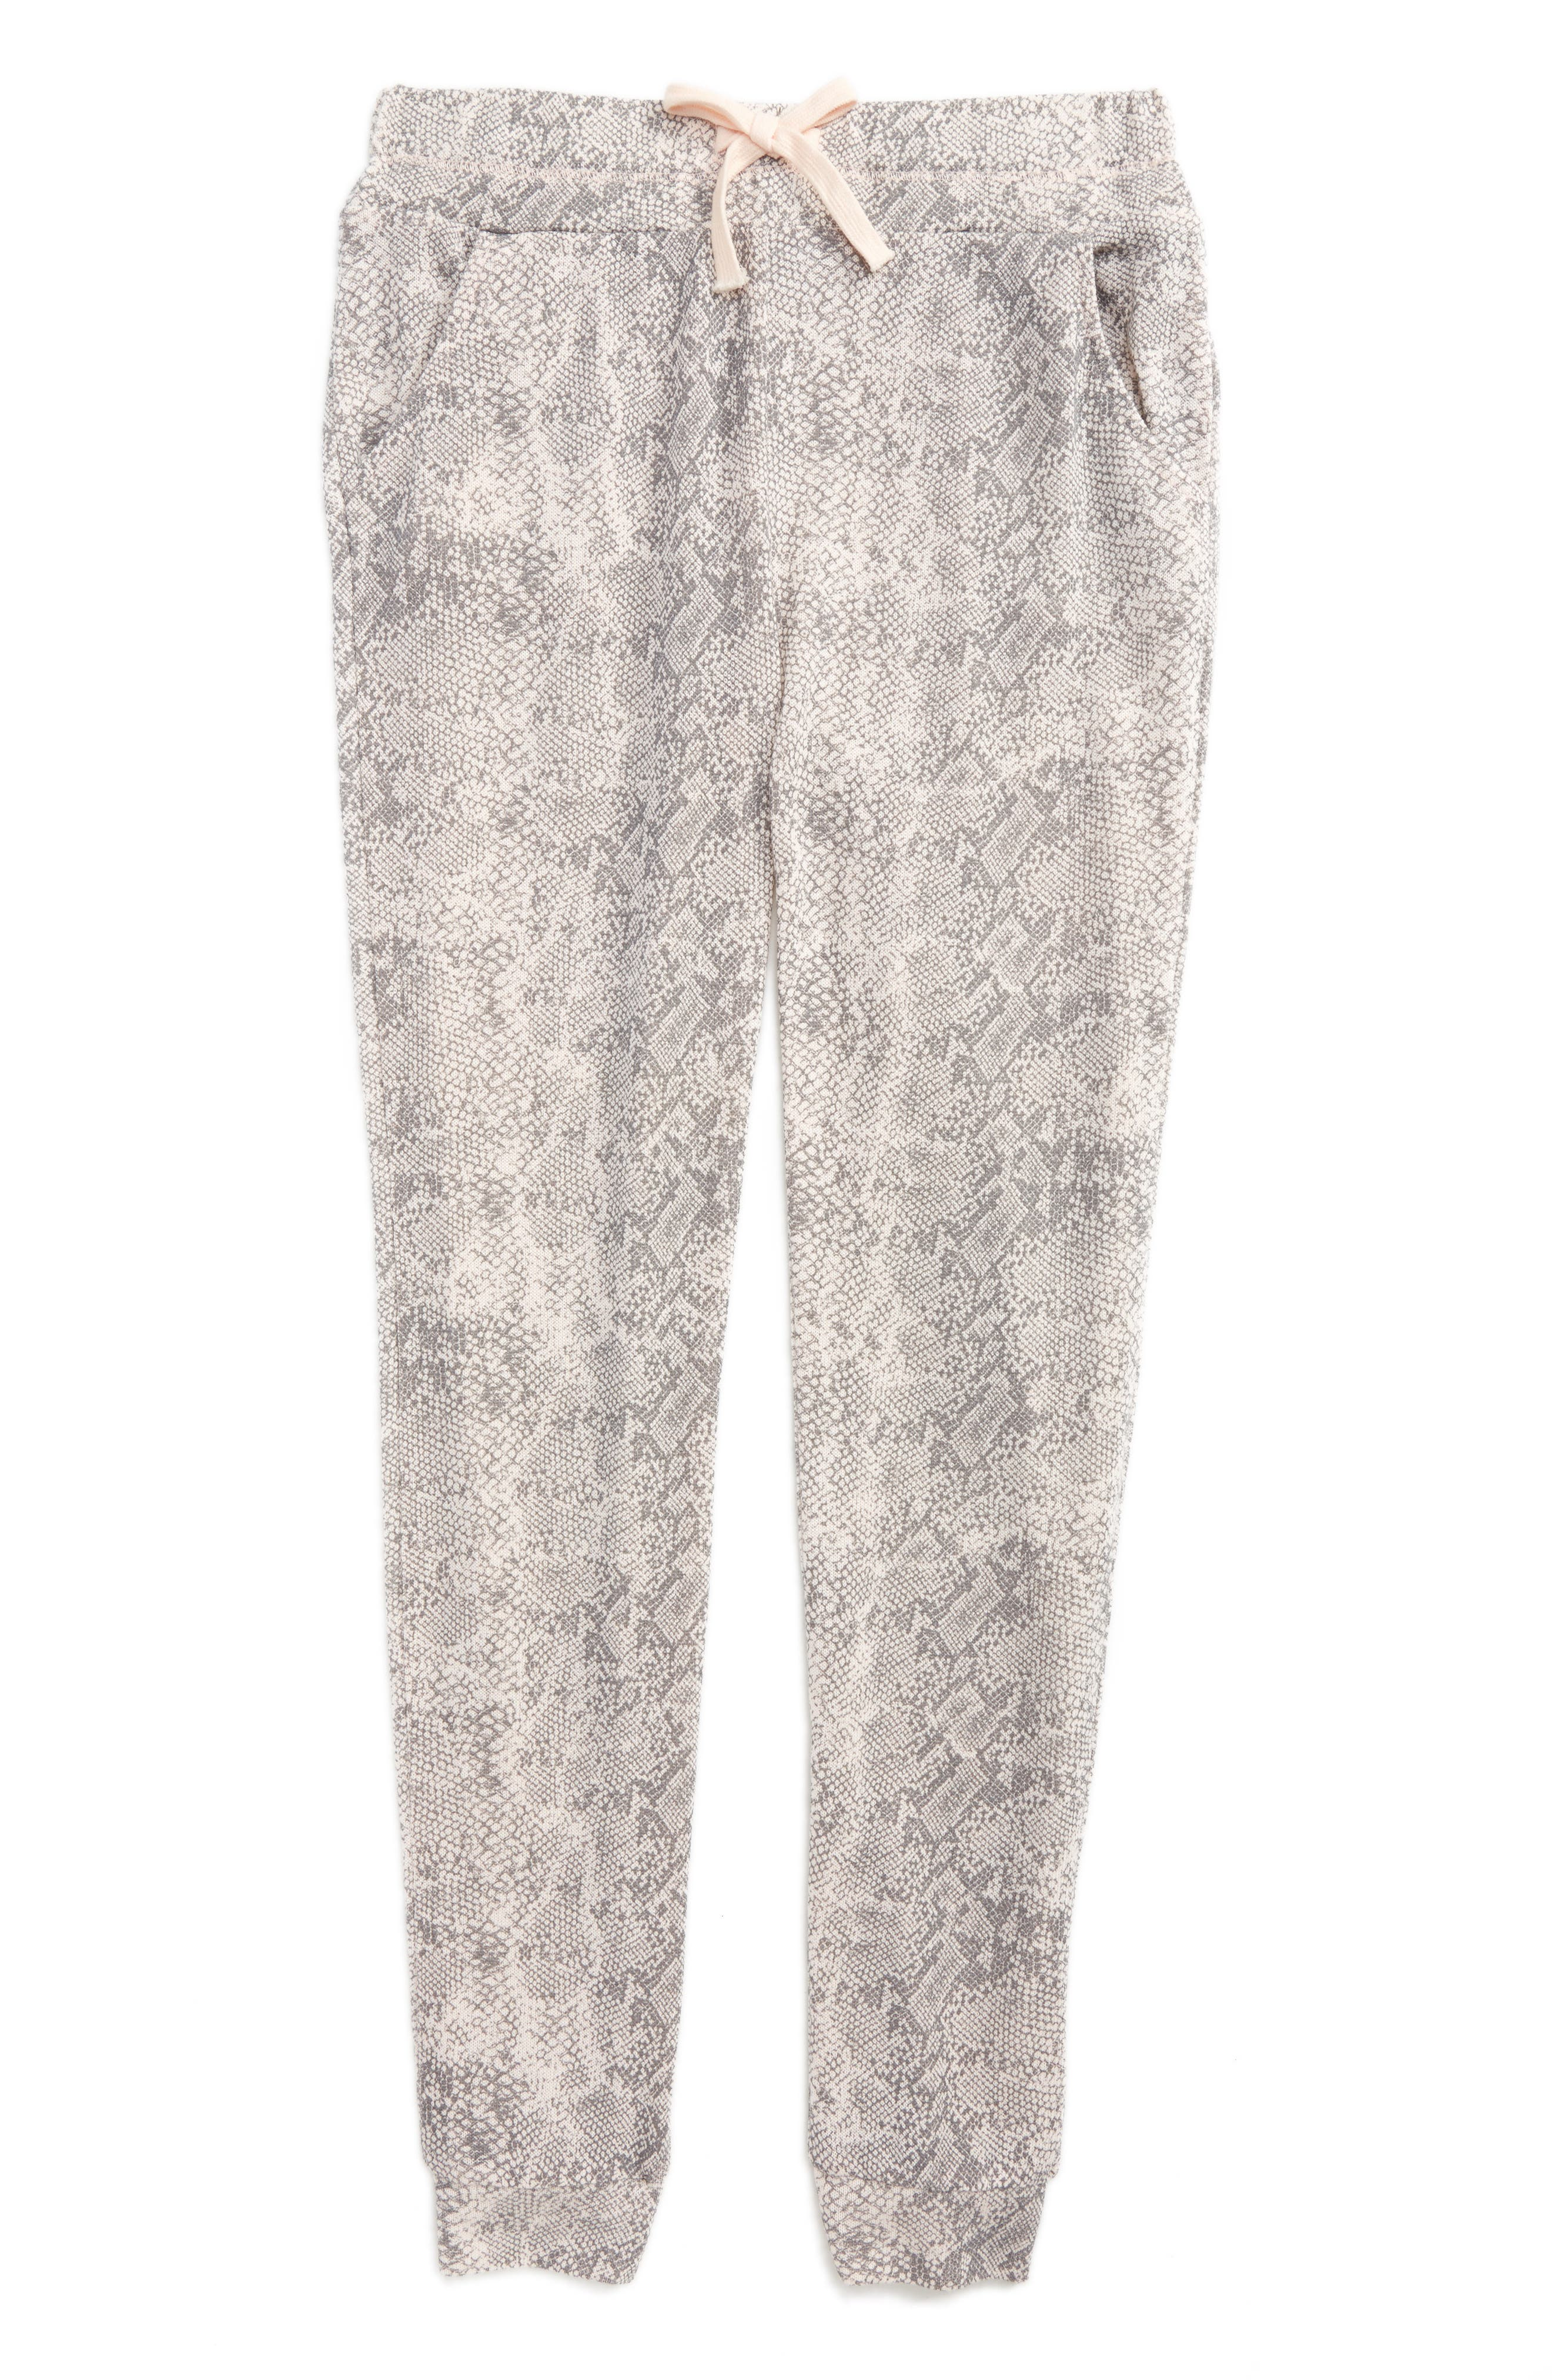 Python Print Knit Jogger Pants,                         Main,                         color,